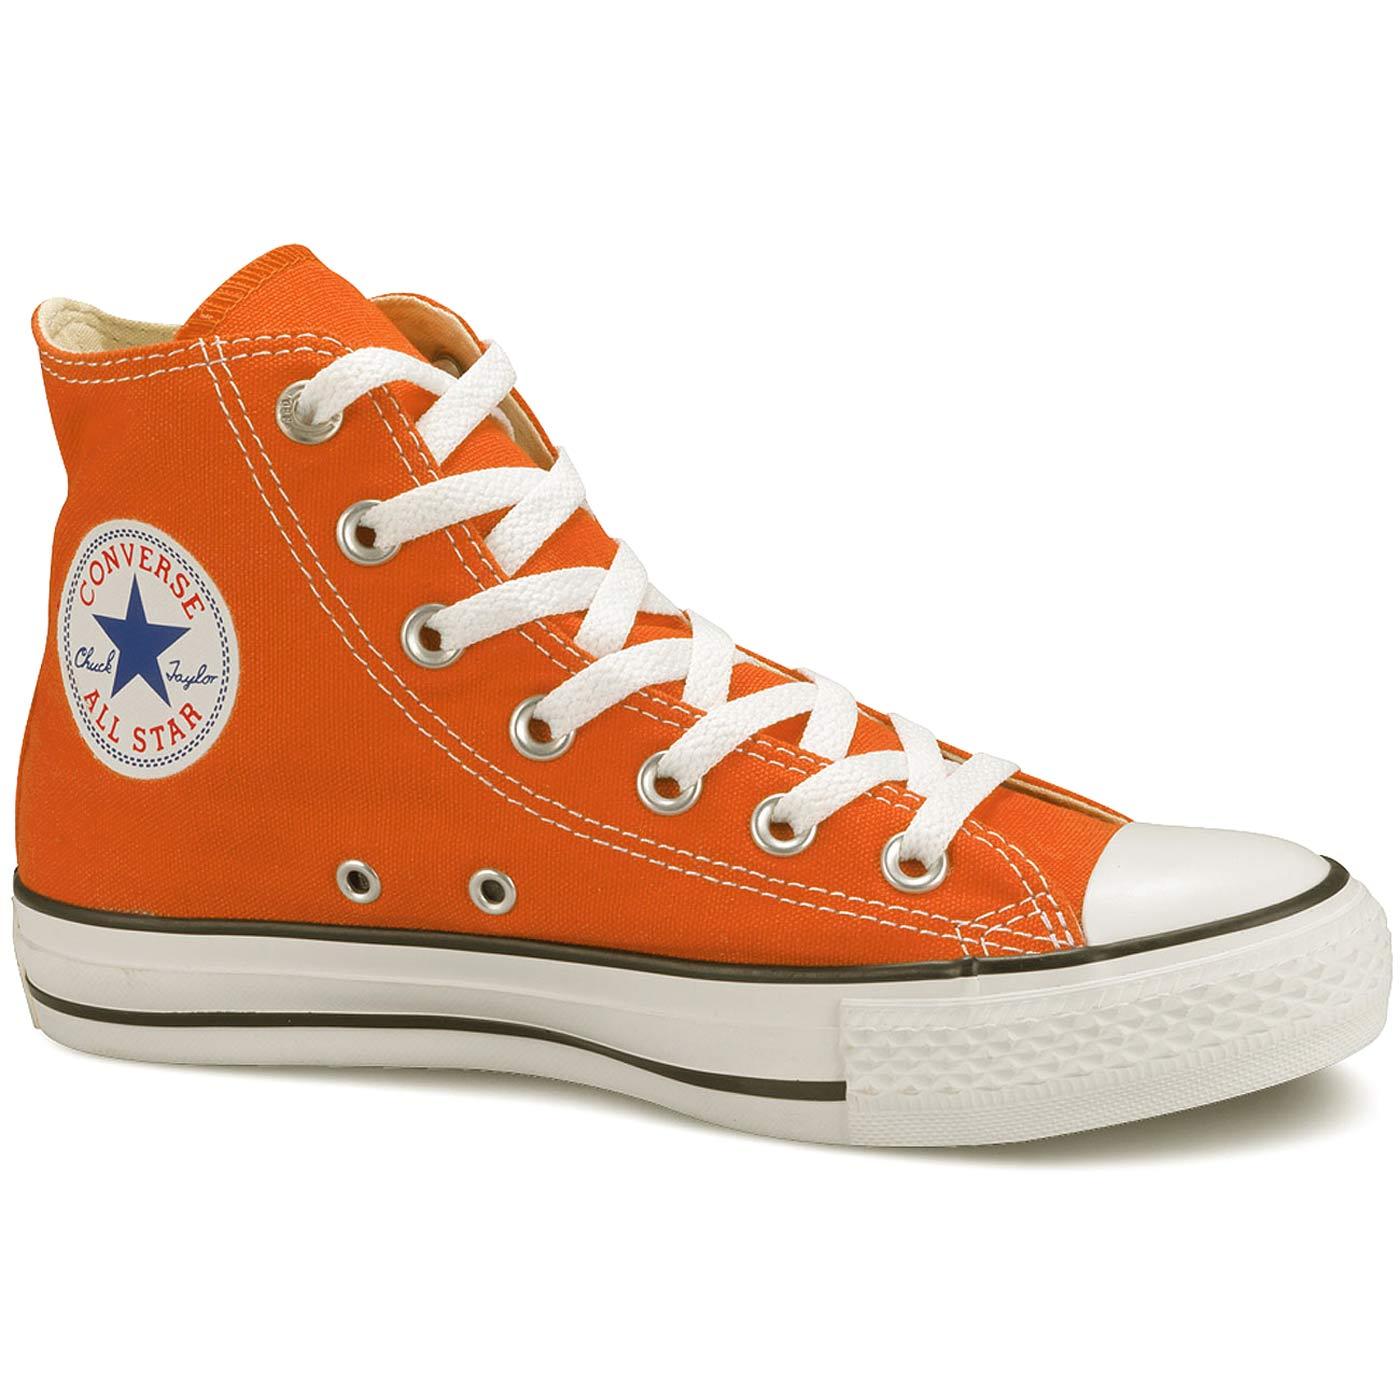 Orange And Pink Shoes Uk